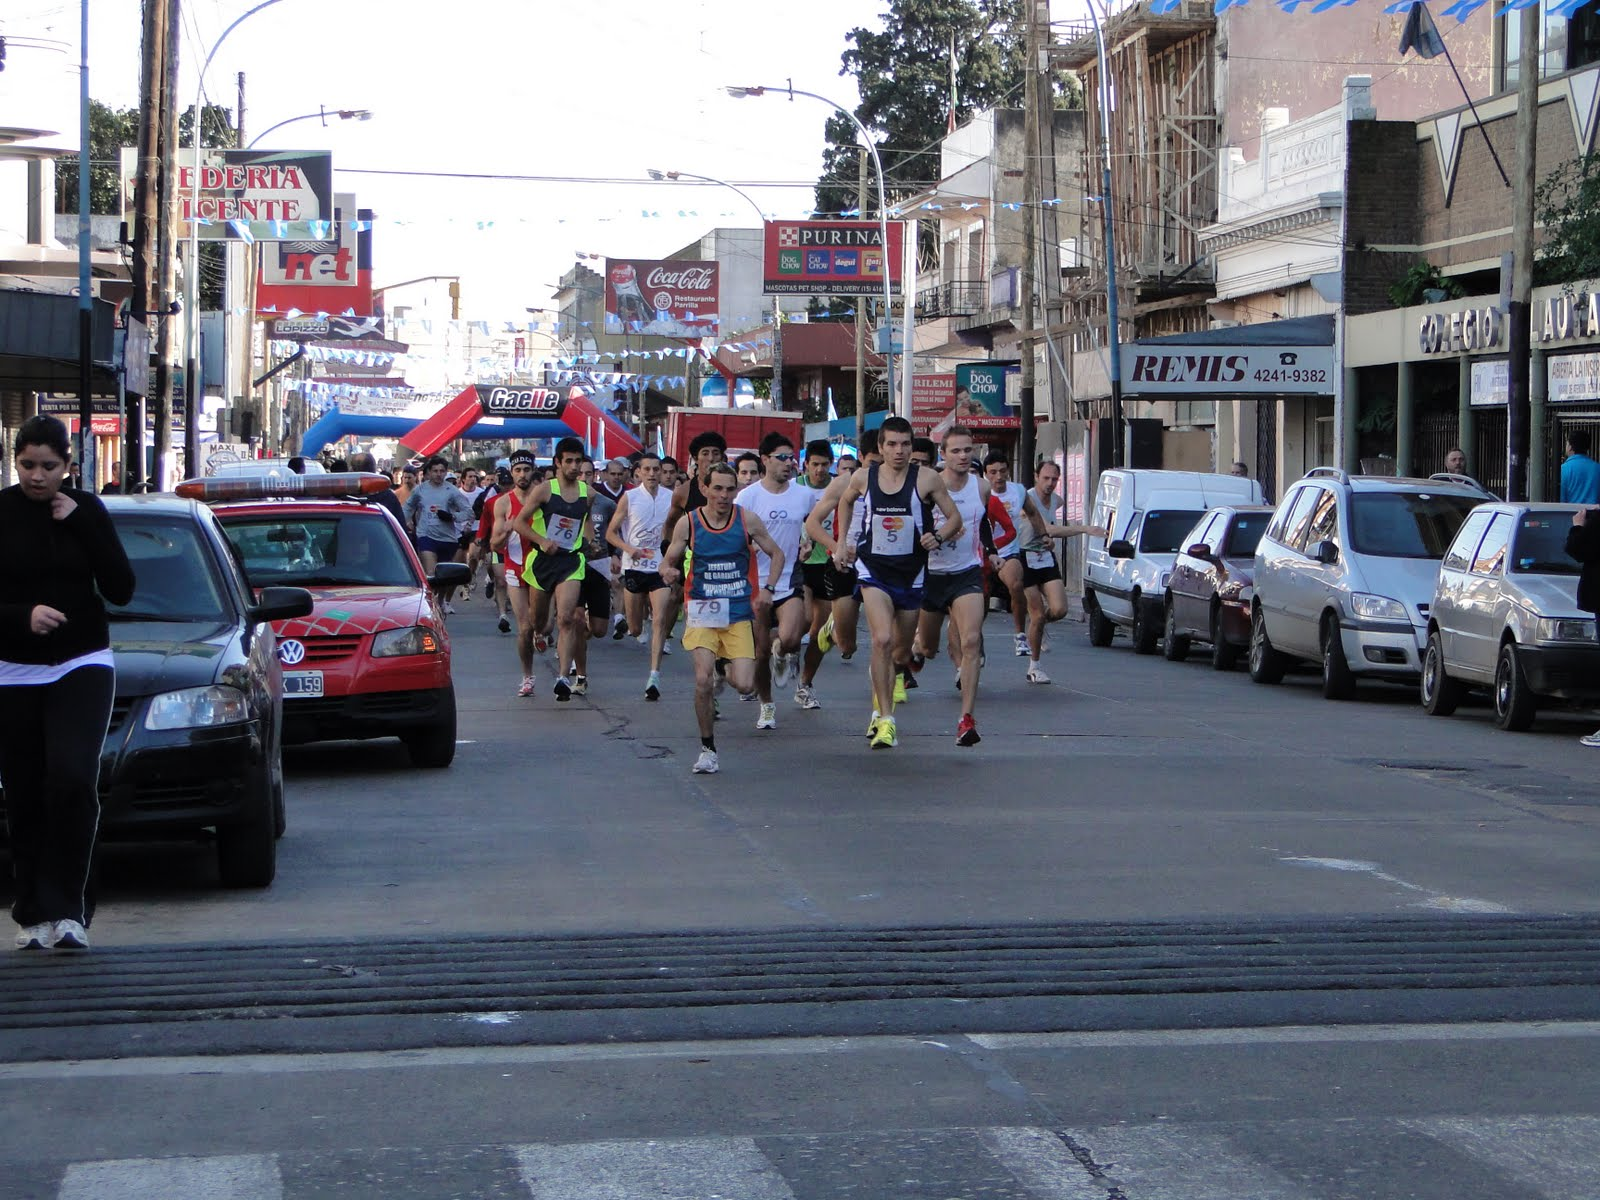 Maraton ciudad de lanus for Muebles 9 de julio lanus